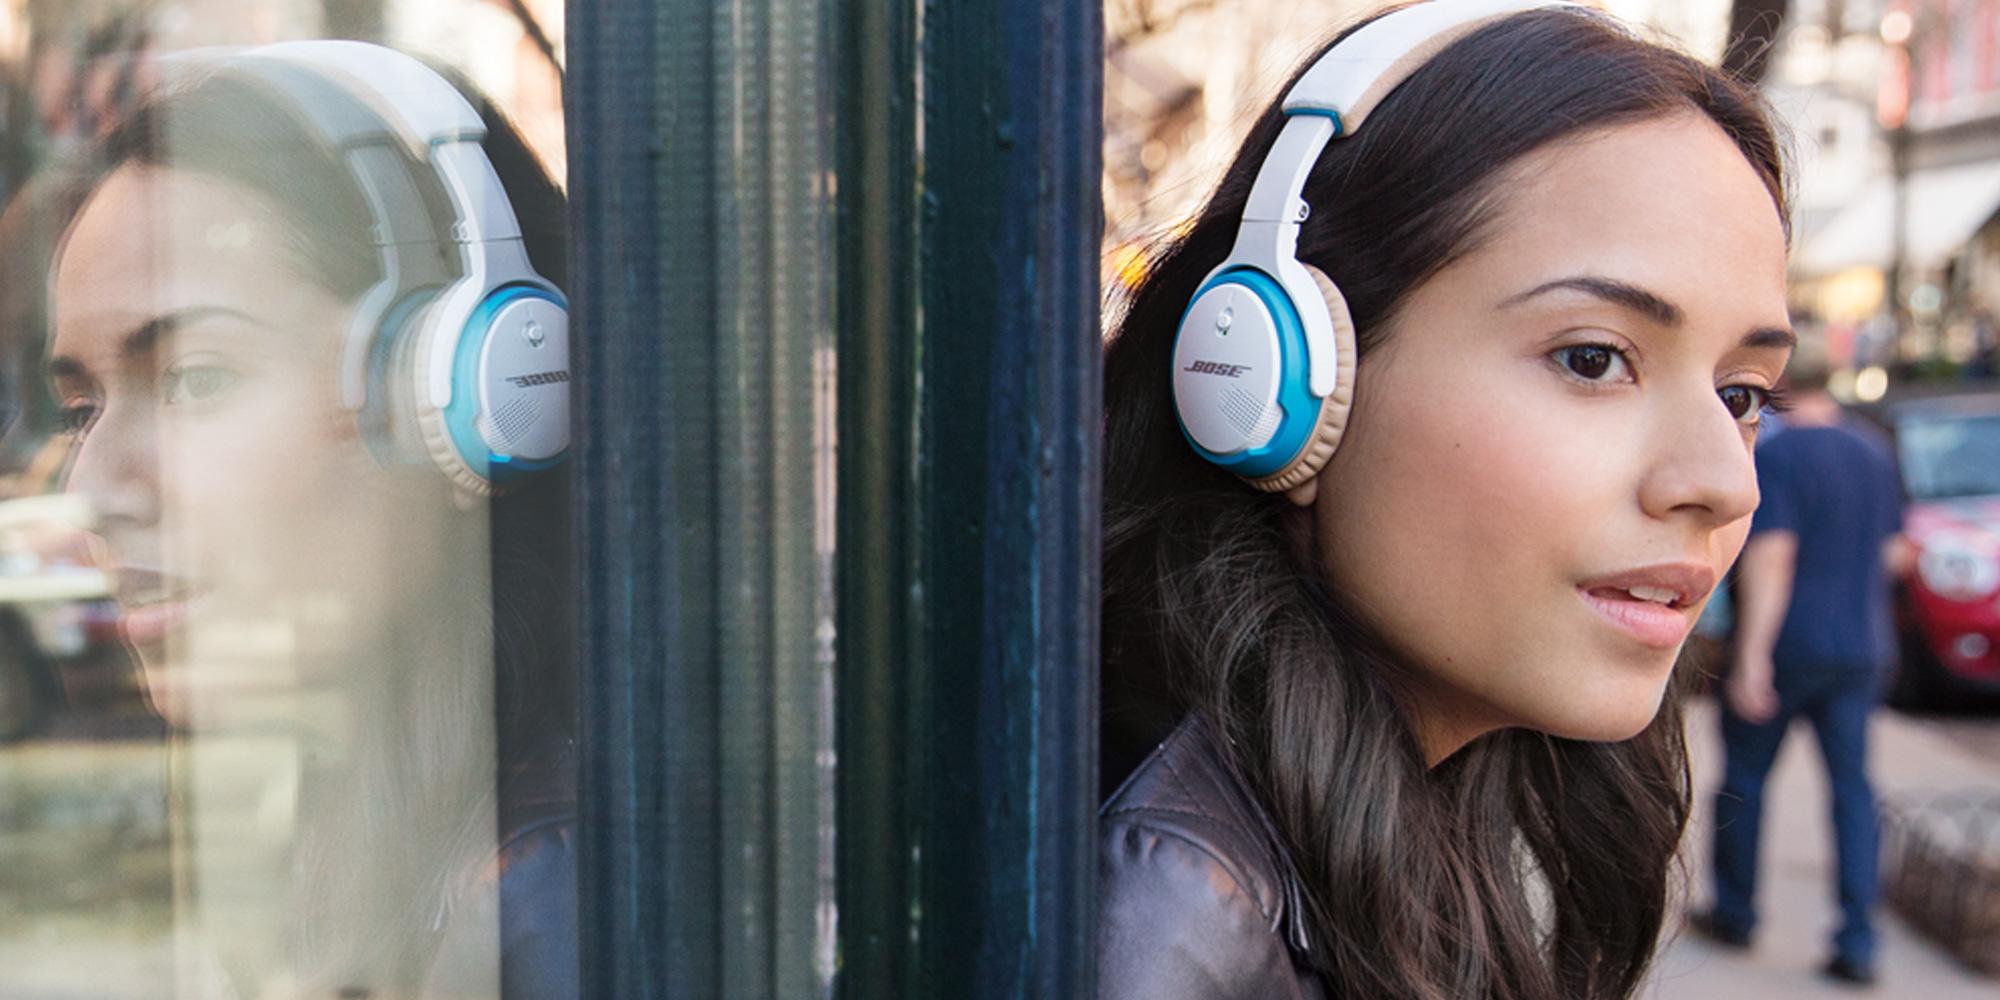 Bose SoundLink on-ear Bluetooth headphones drop to $100 (Reg. $180)